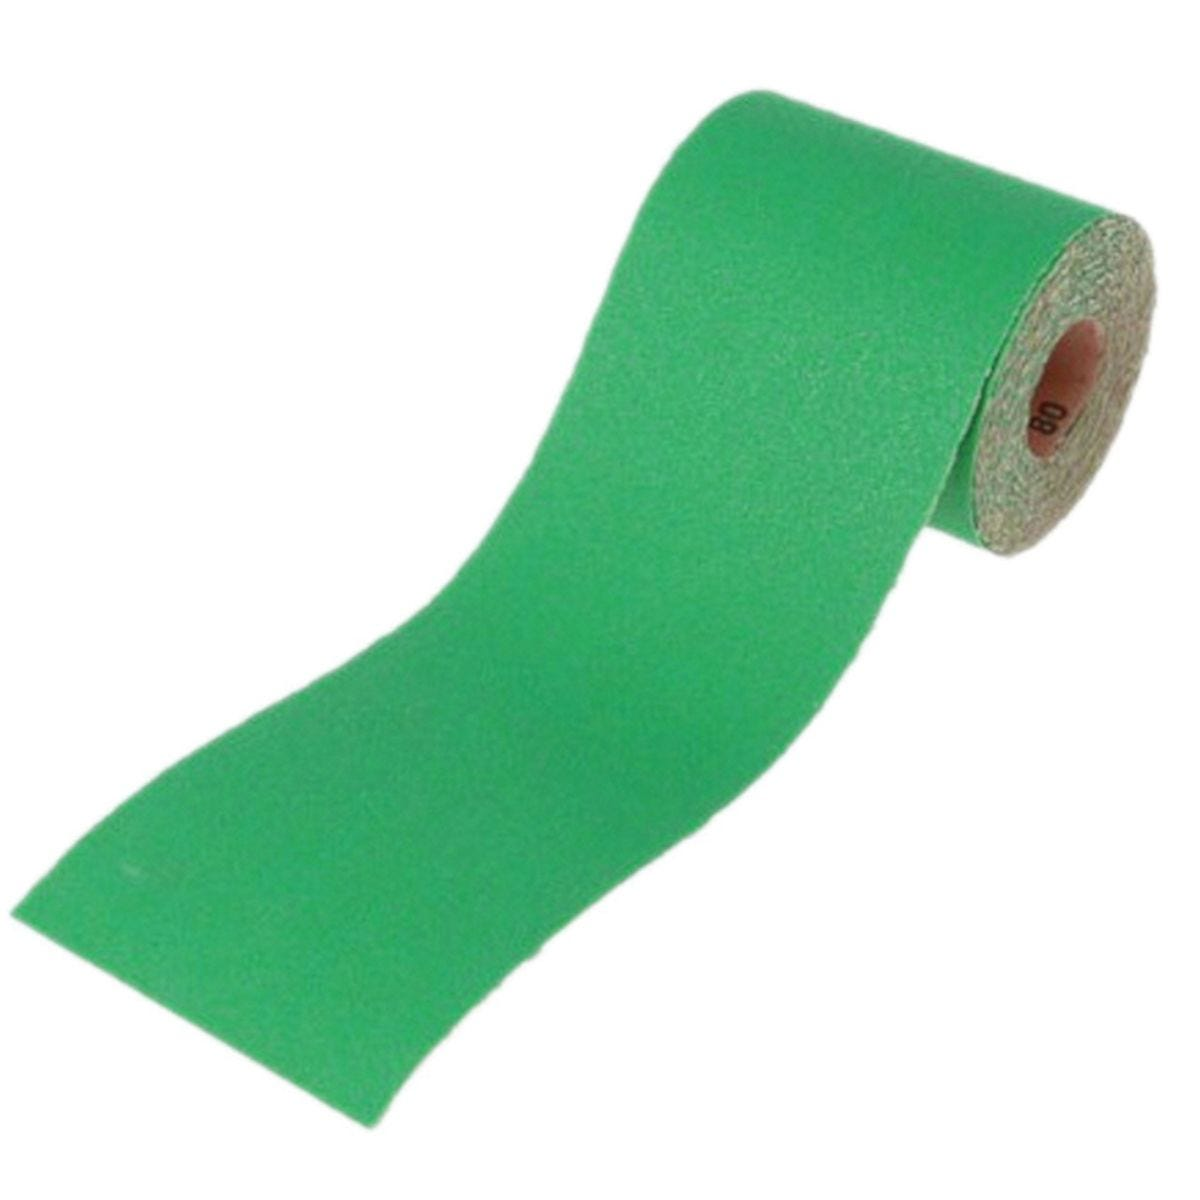 Faithfull Aluminium Oxide Sanding Paper Roll Green 115mm x 5m - 80g